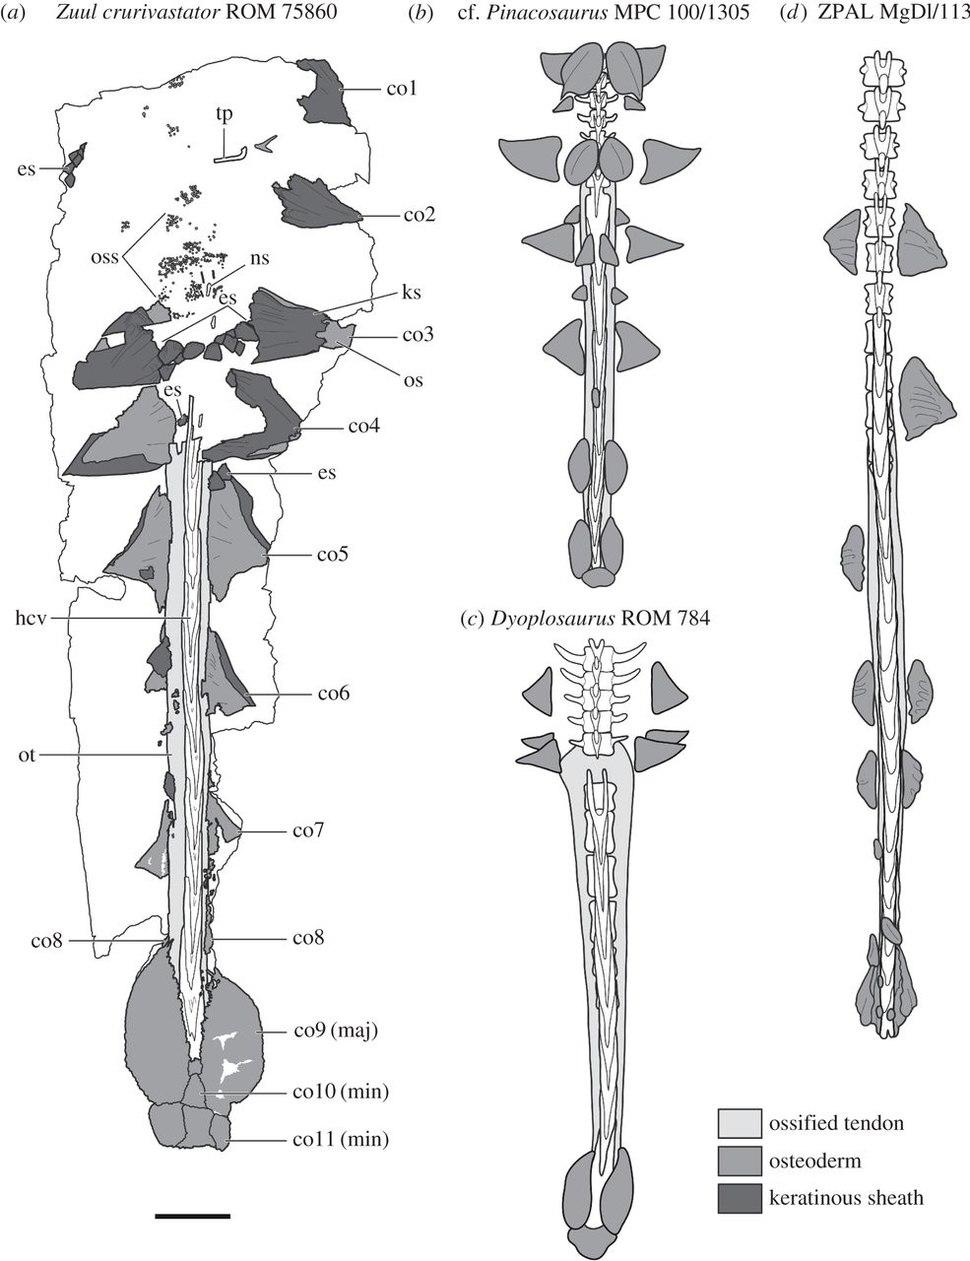 Ankylosaurine tails